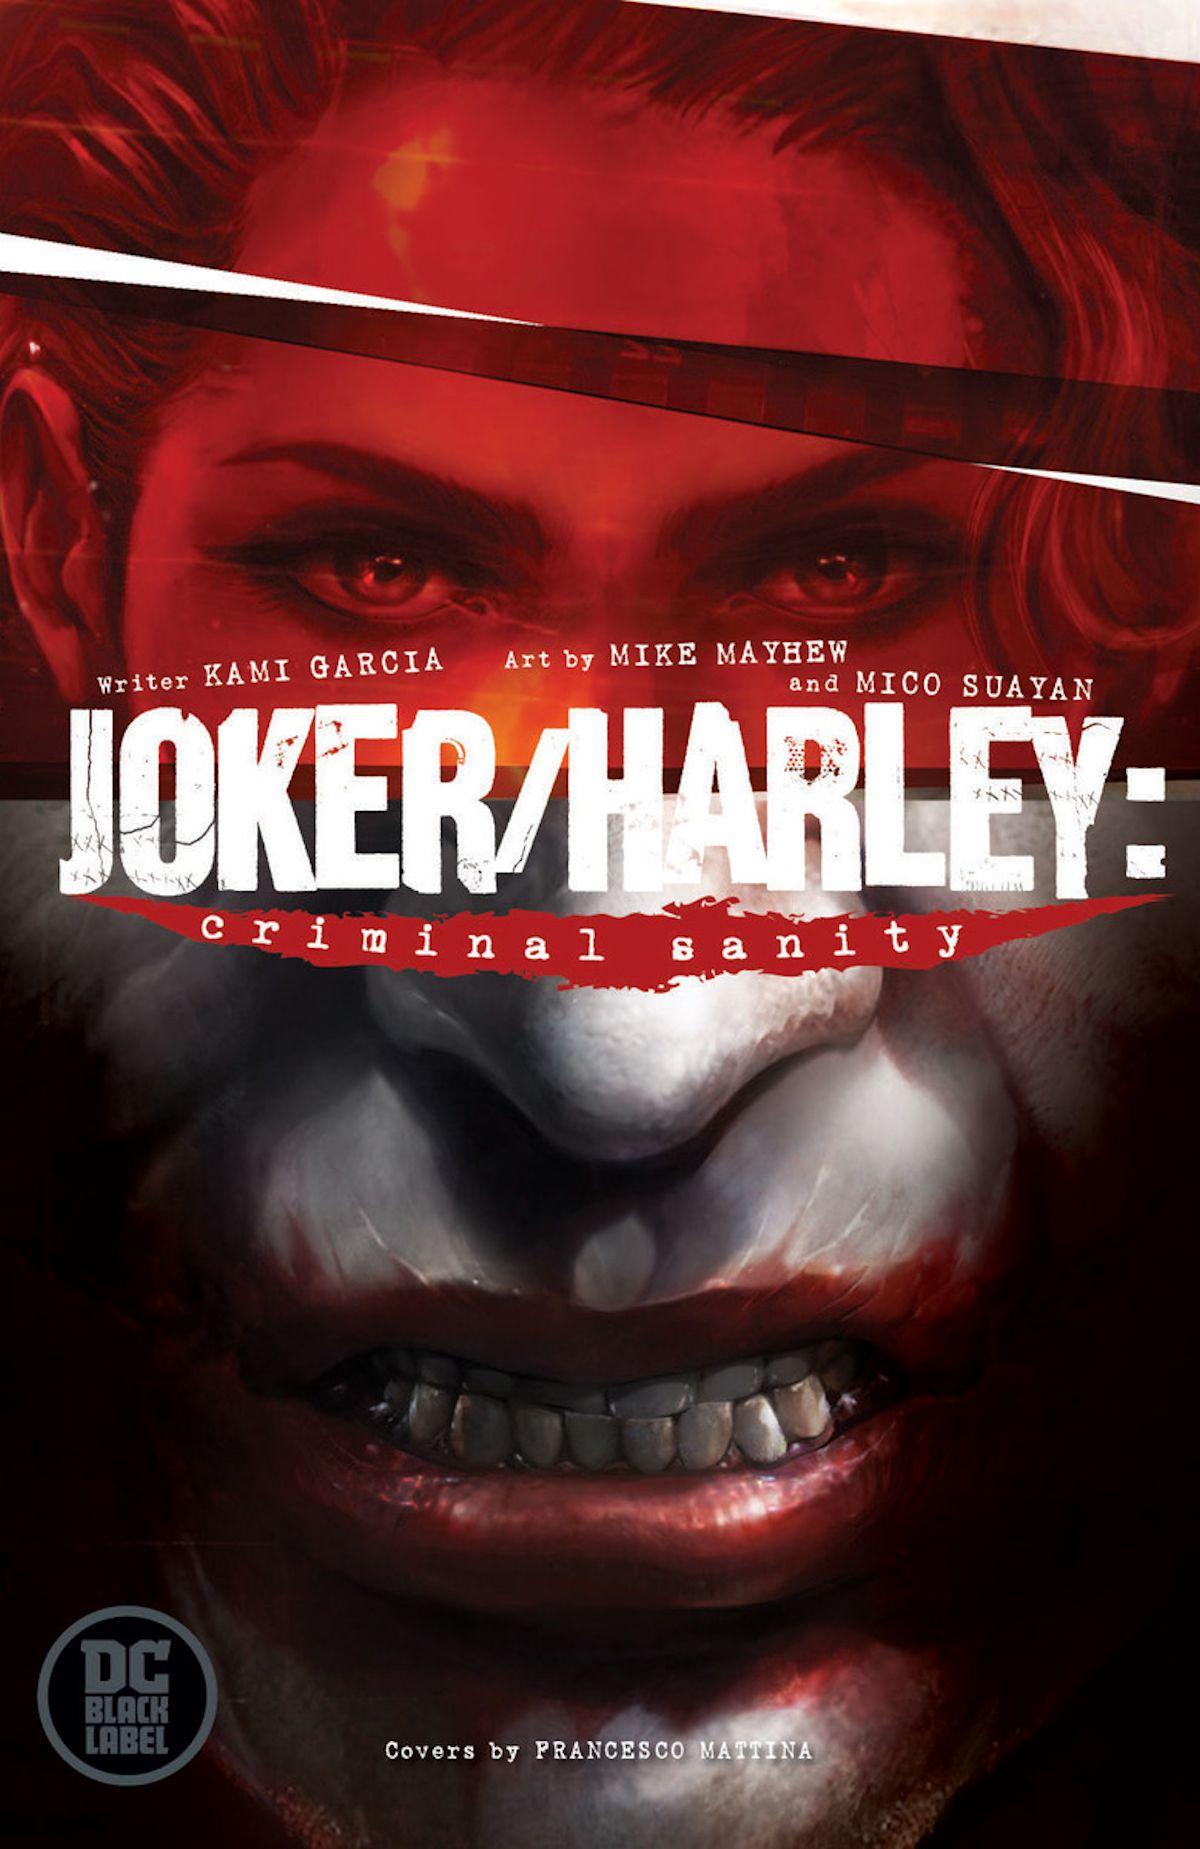 Joker / Harley: Criminal Sanity